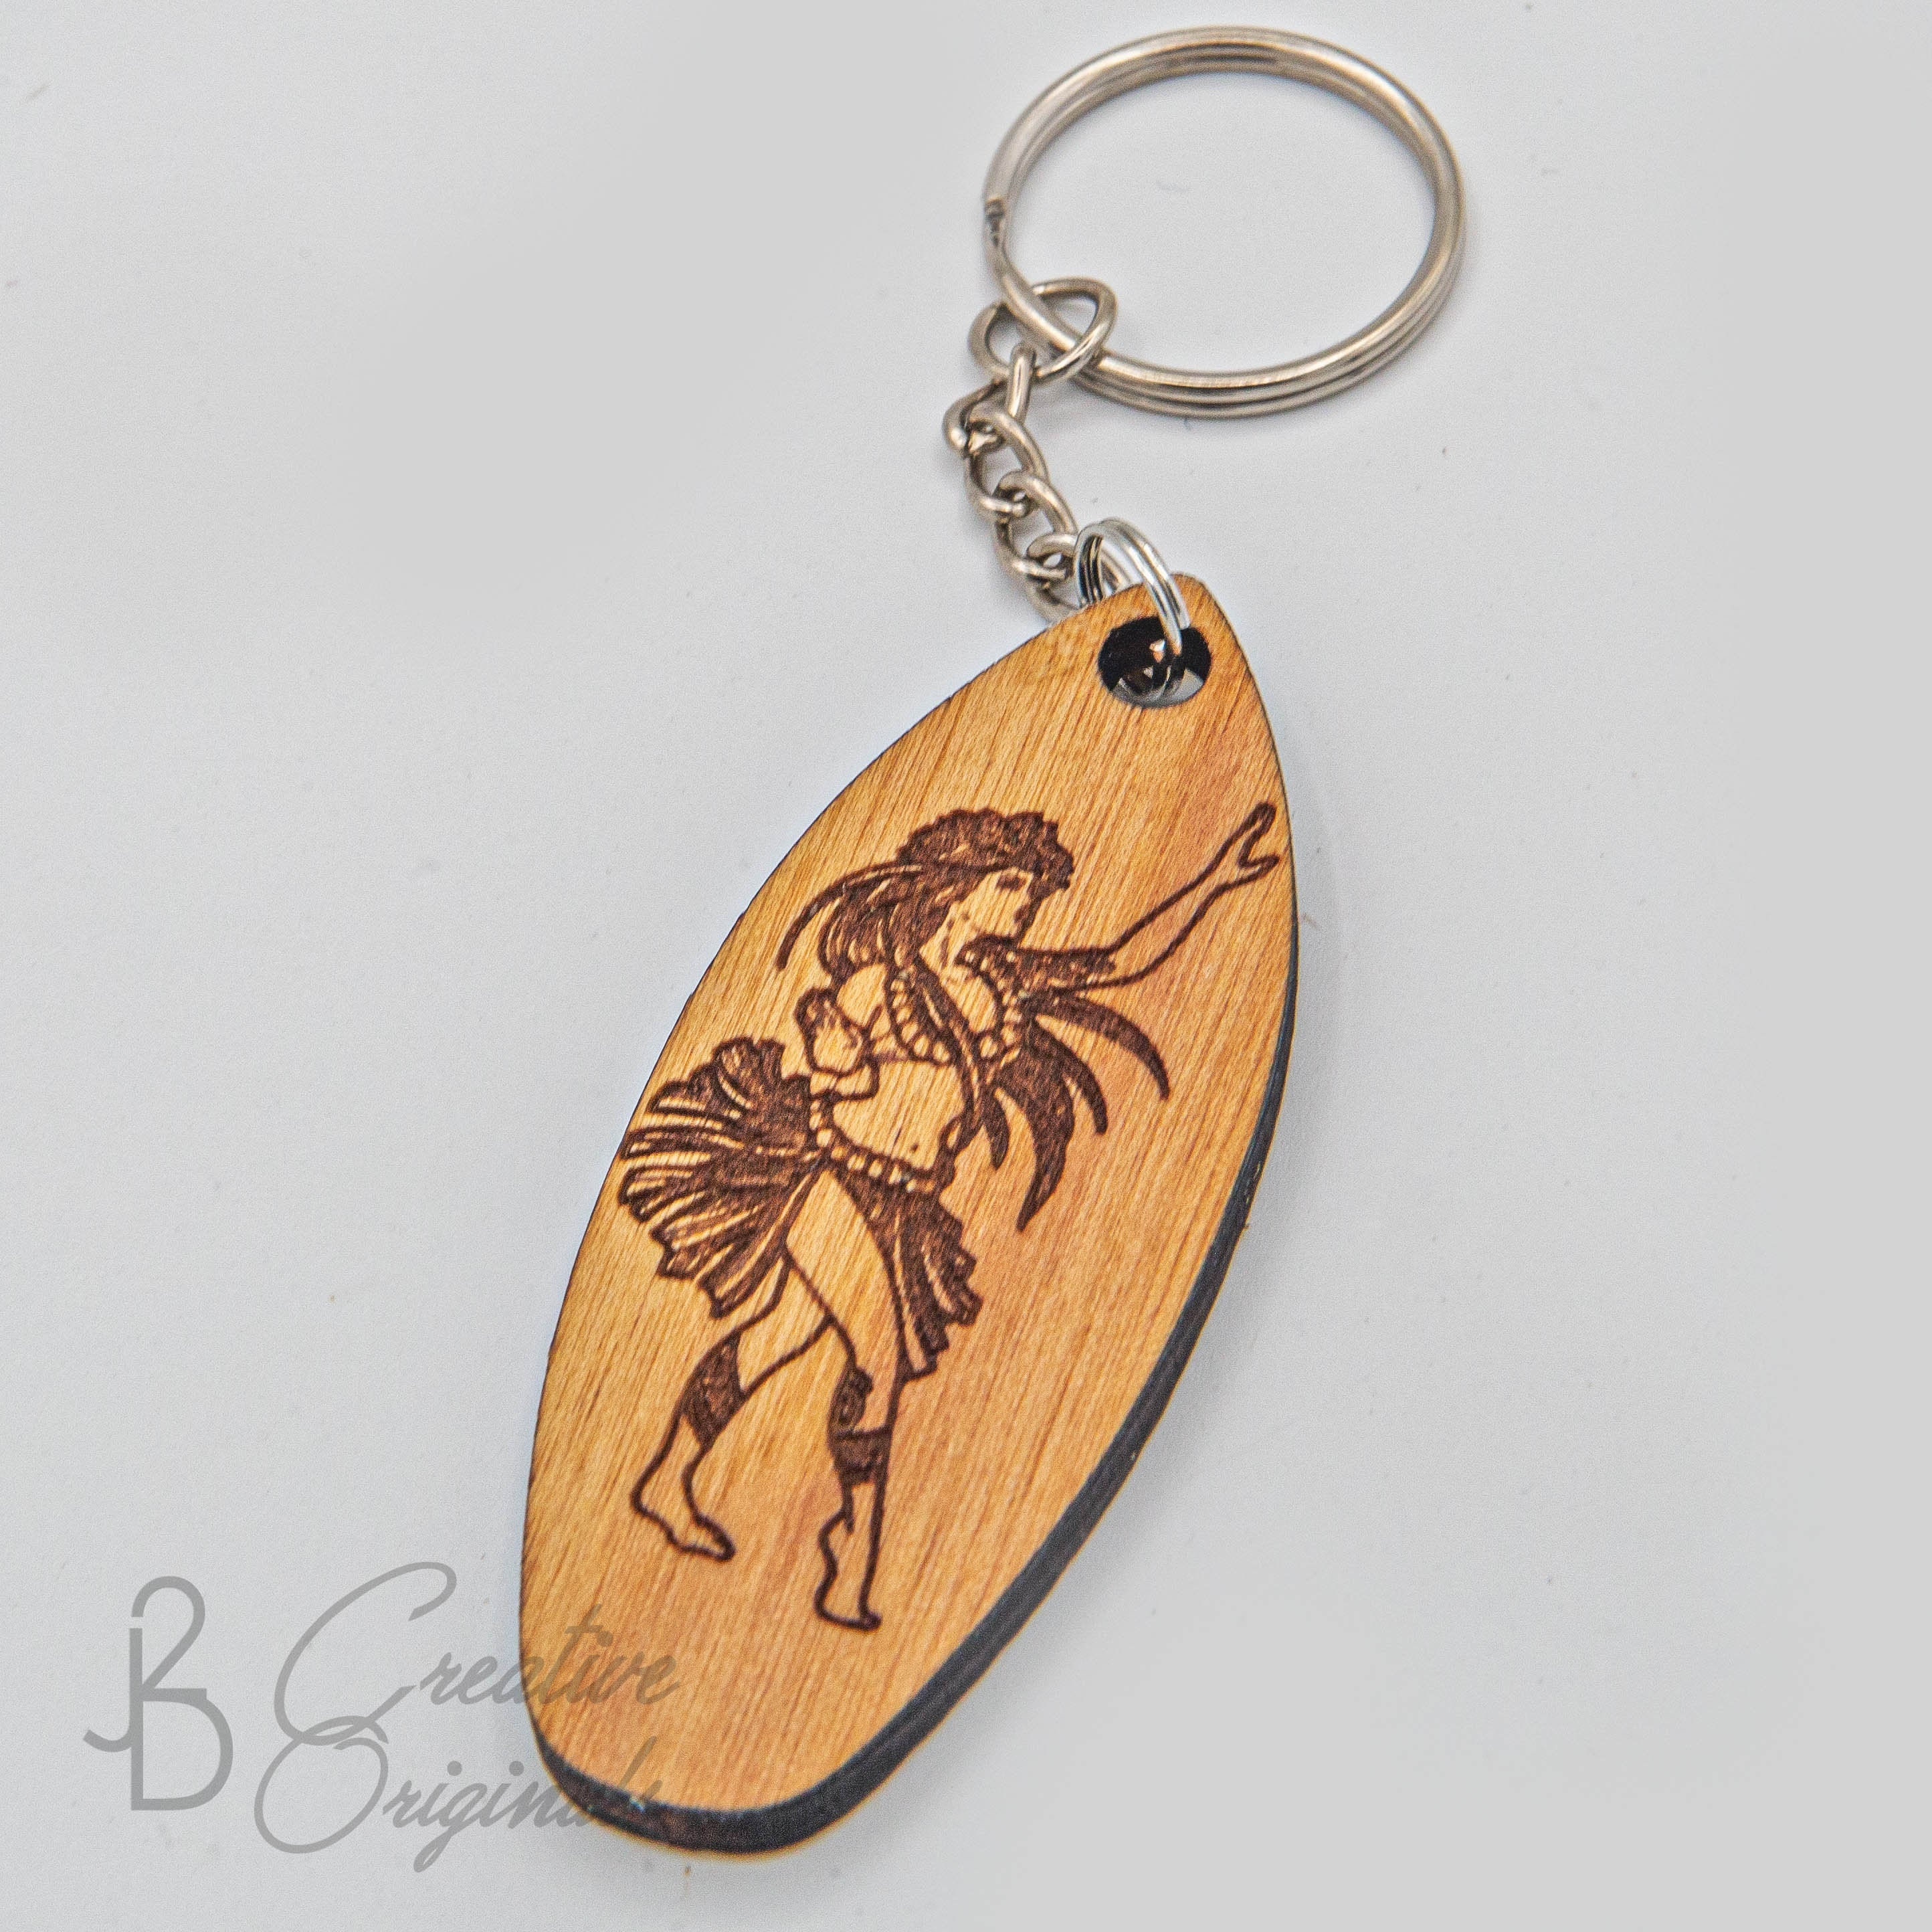 Made in Hawaii Stocking Stuffer Custom Designs Engraved Wood Surf Engraved Keychain Hawaii Keychains Wave Wood Keychains